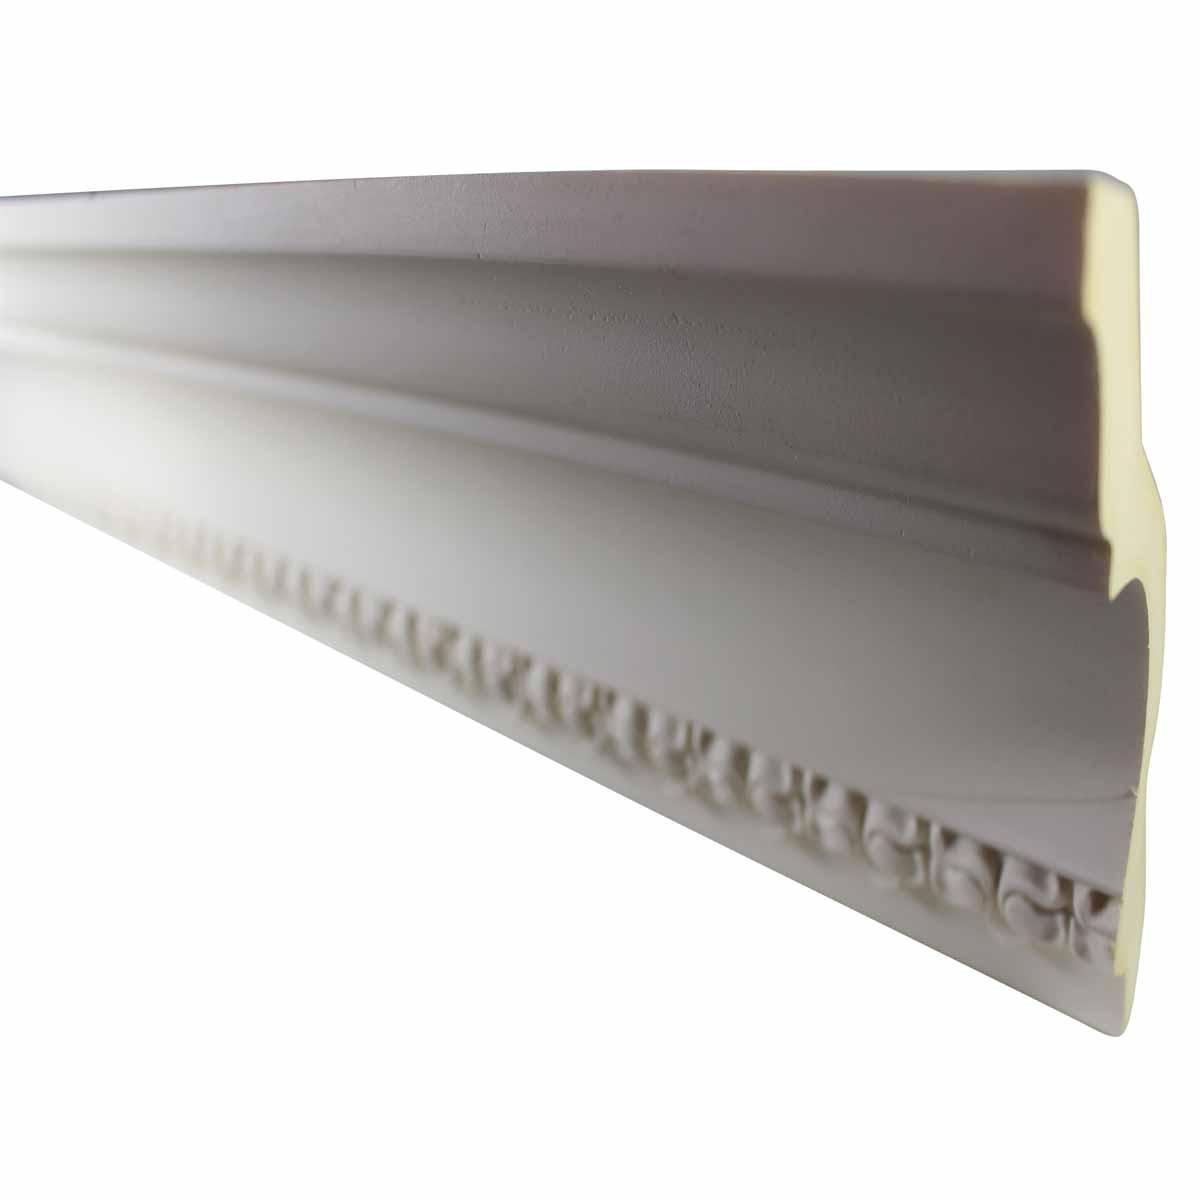 Cornice White Urethane Sample of 11182 23.5 Long Cornice Cornice Moulding Cornice Molding